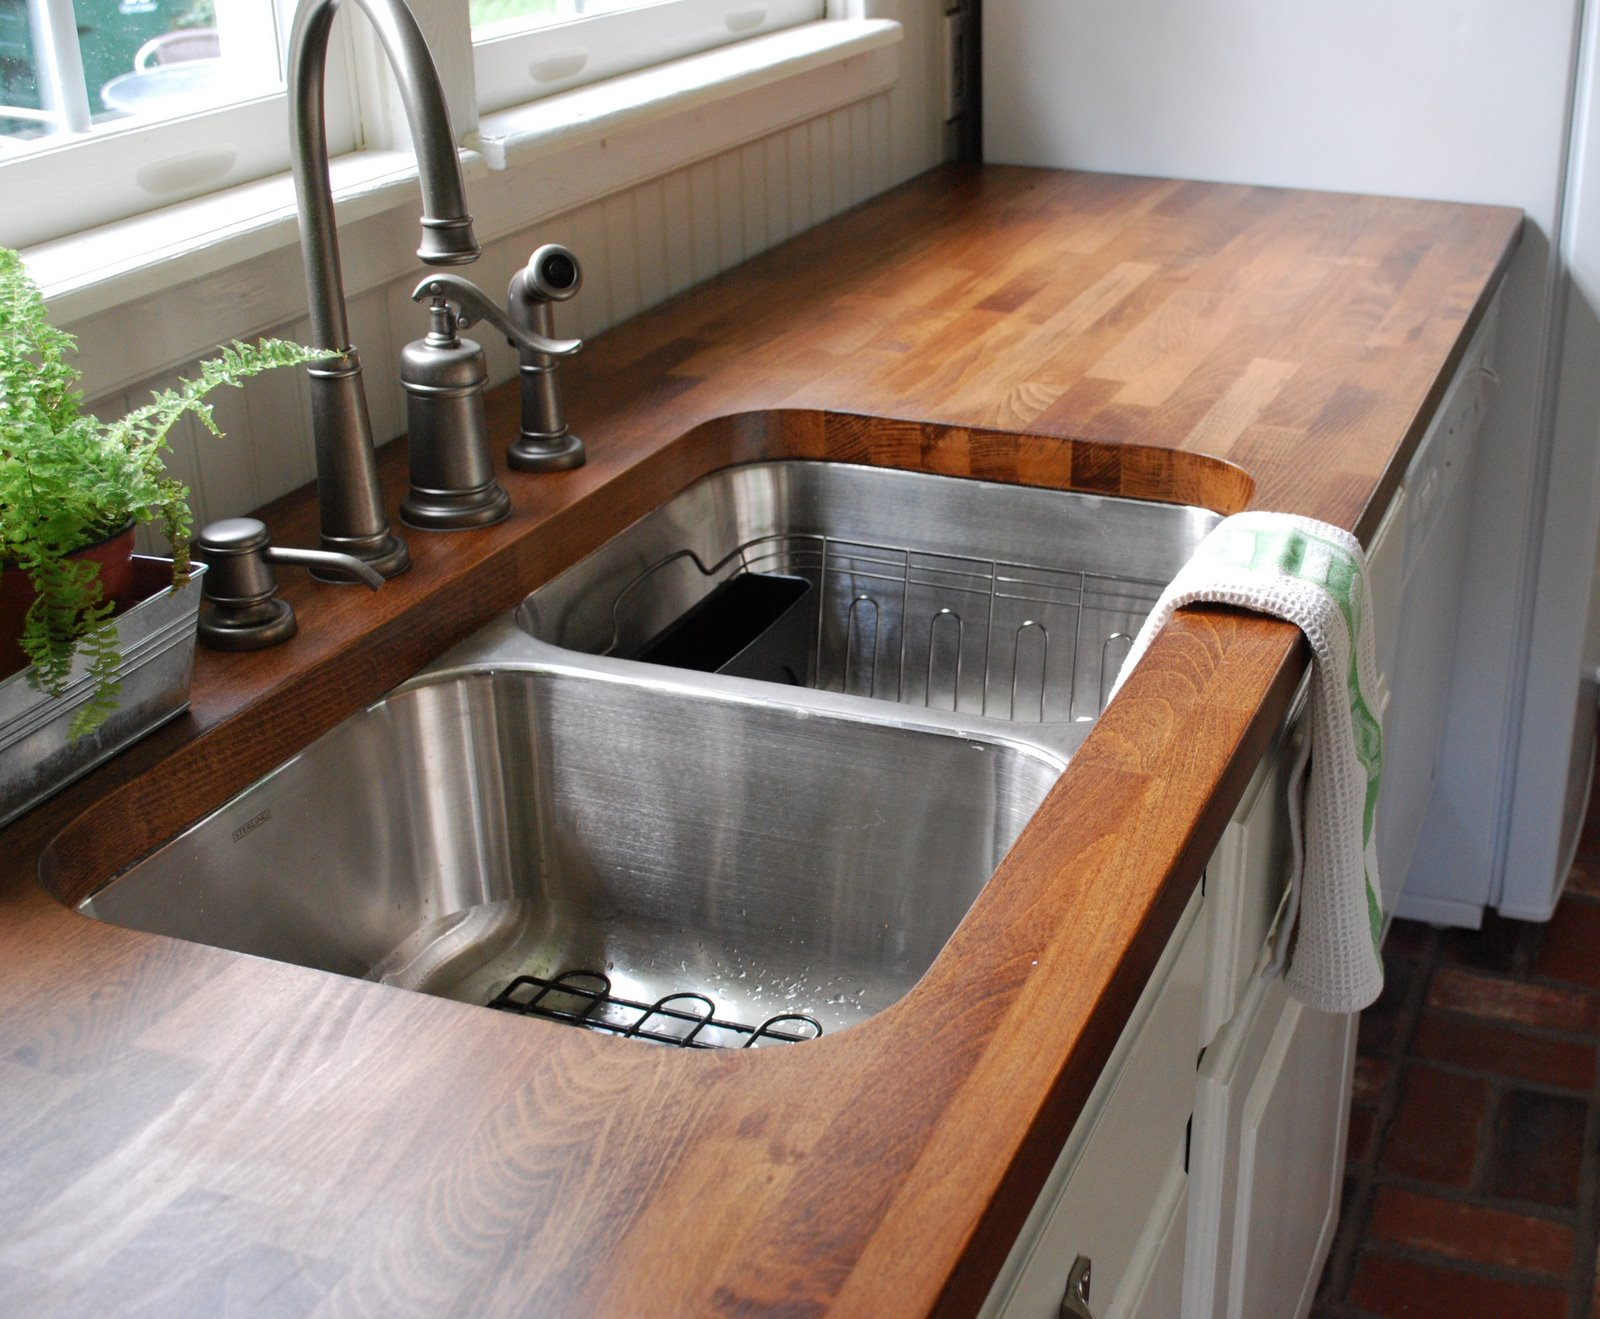 Inexpensive Kitchen Countertop to Consider | HomesFeed